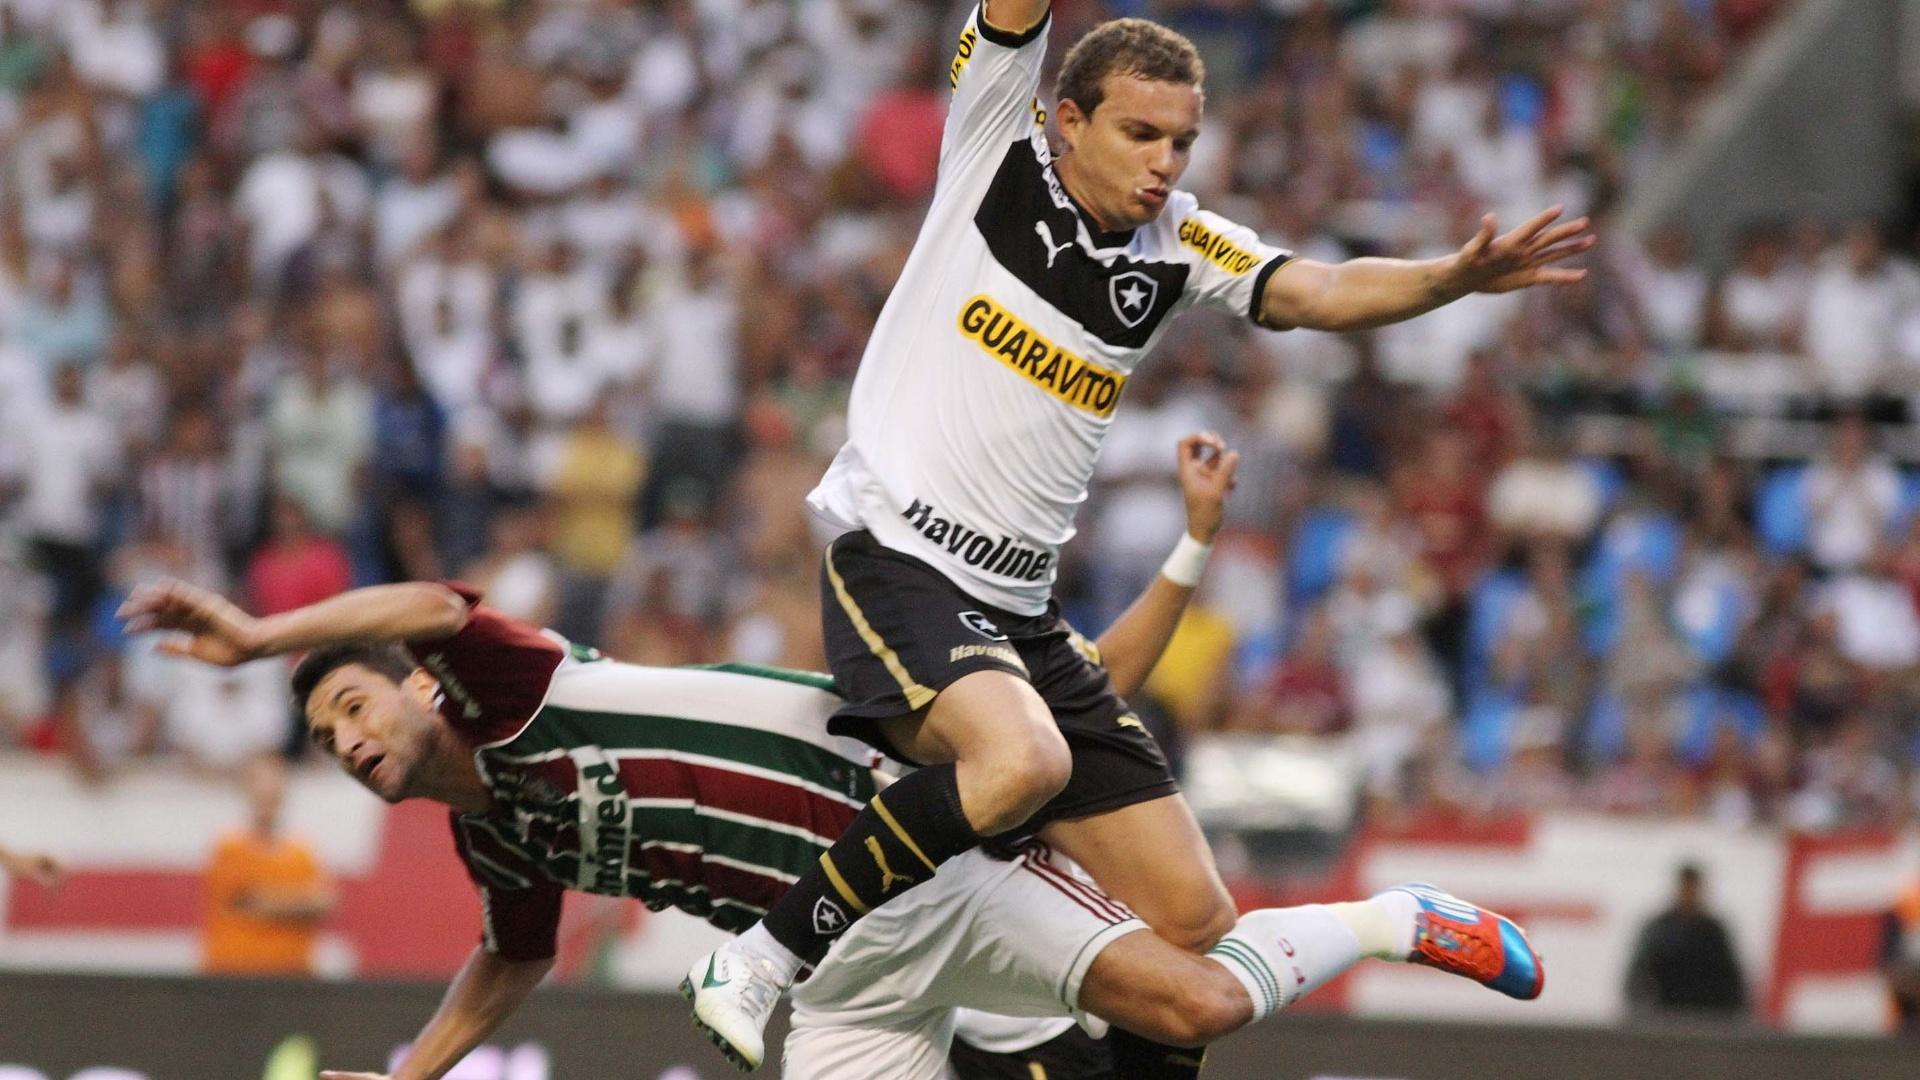 71fc6fdf18 Marcelo Mattos será reavaliado nesta terça e pode enfrentar o Vasco na  quinta - 15 10 2012 - UOL Esporte